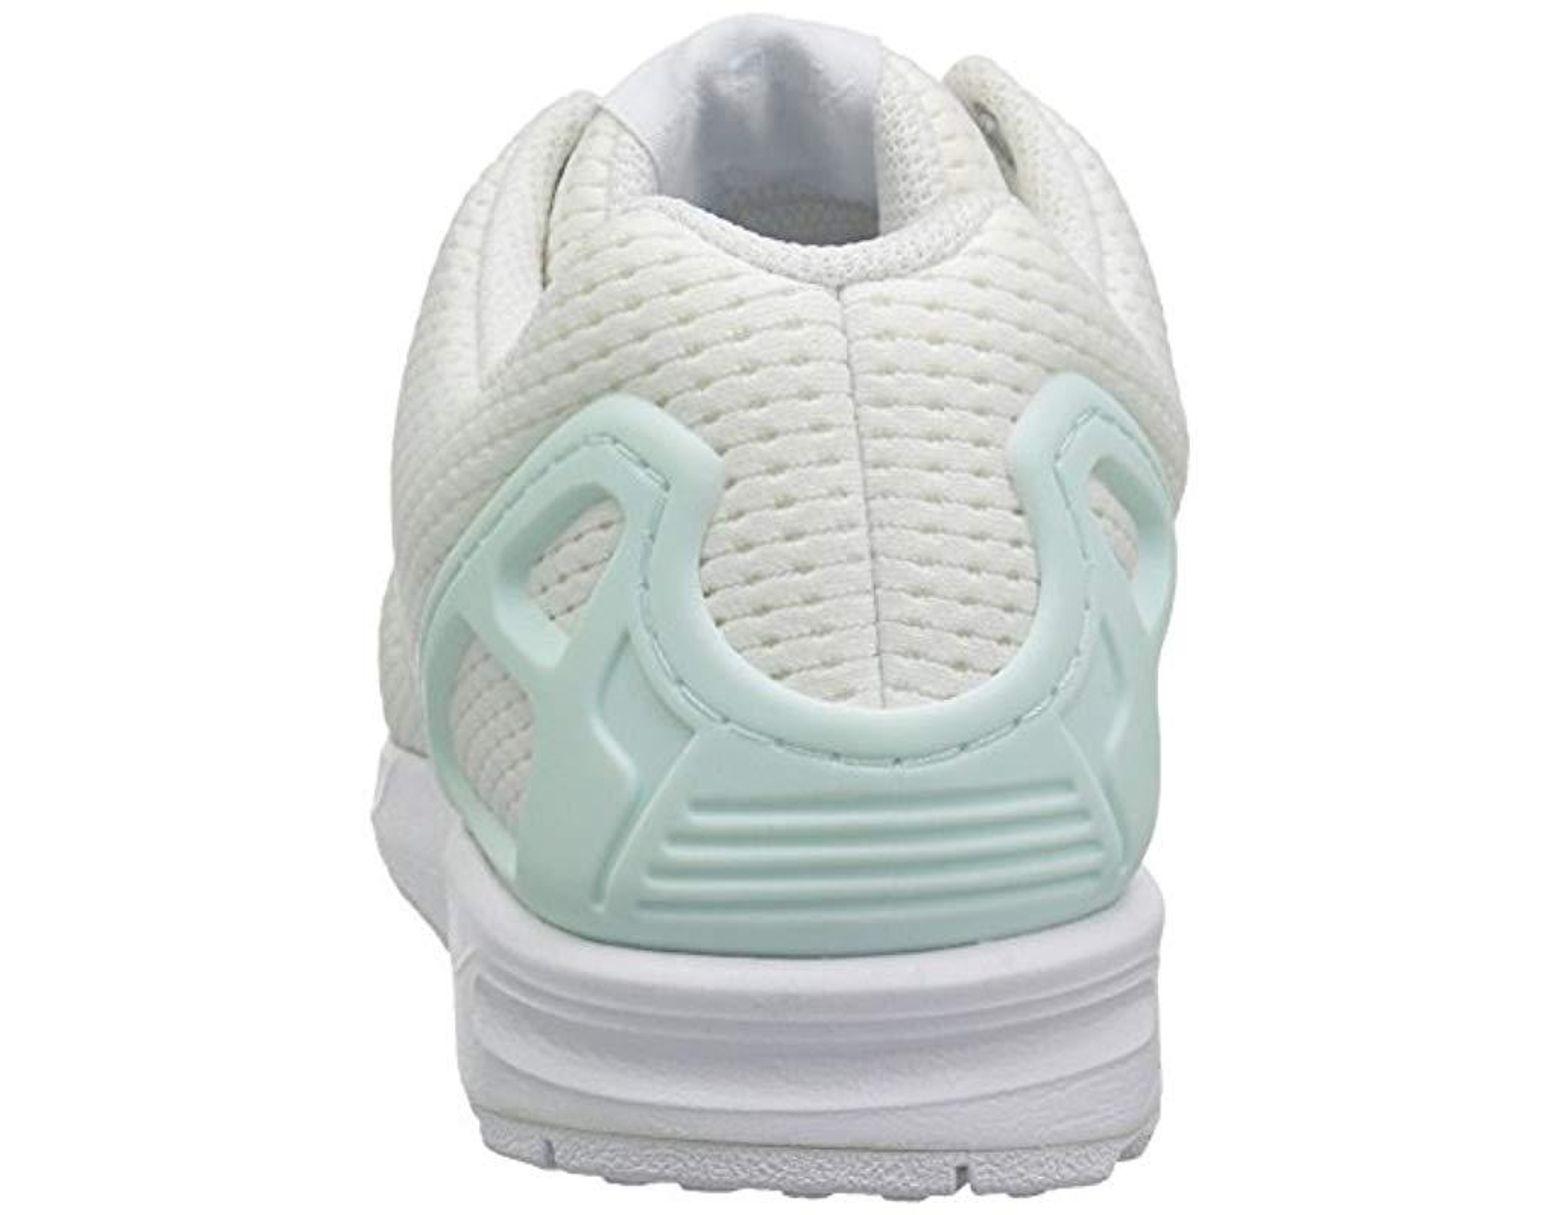 fcac8977a Lyst - adidas Originals Zx Flux W Running Shoe in White